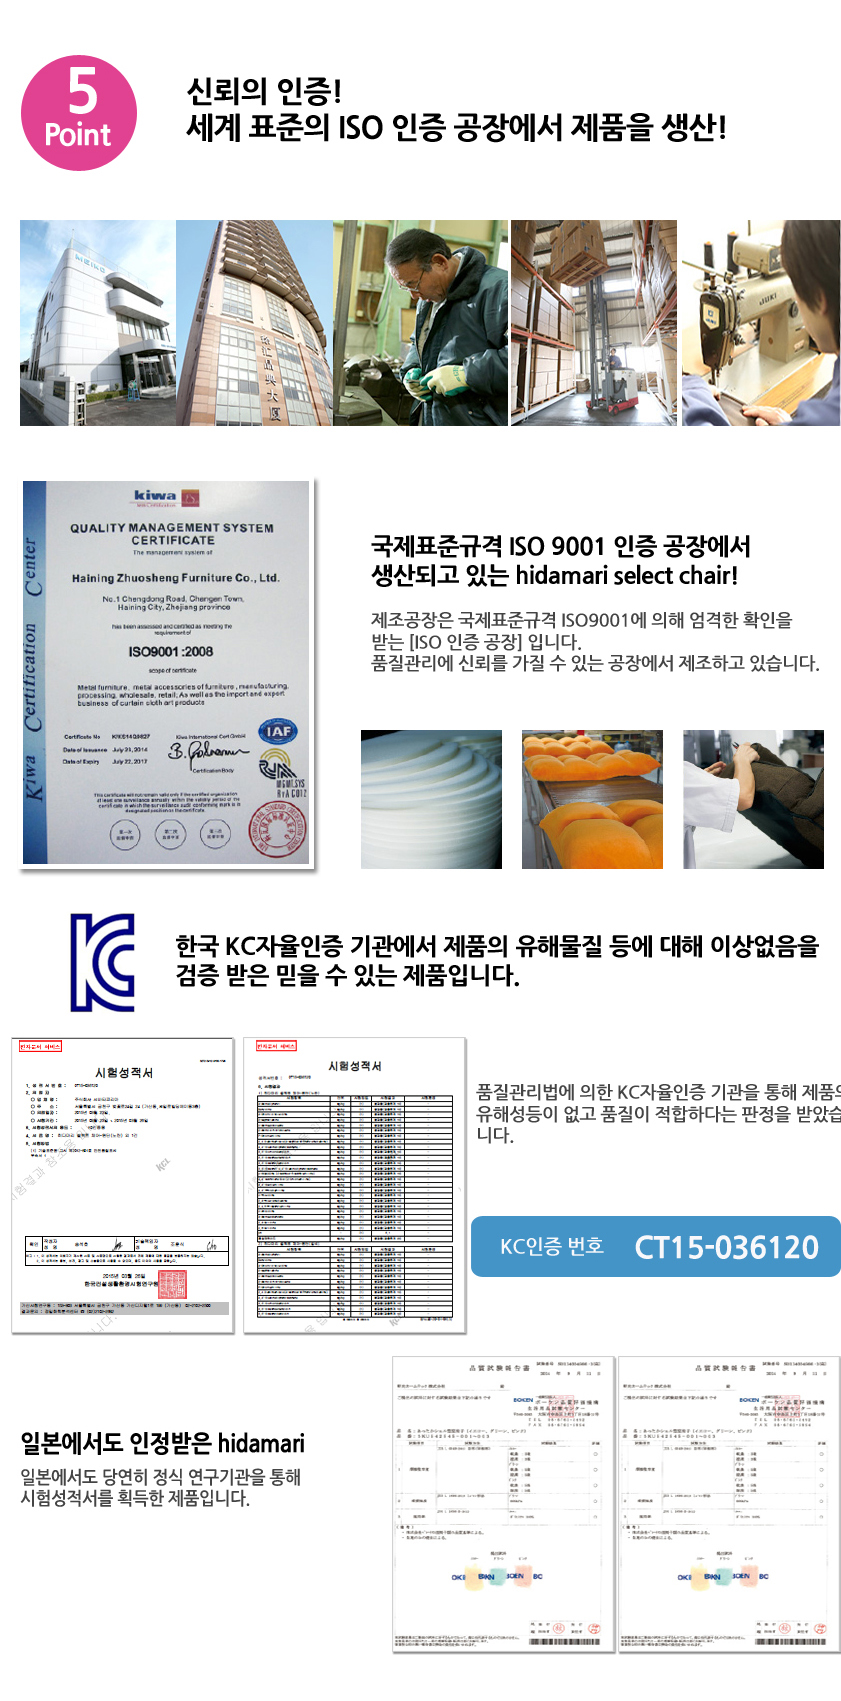 hidamari 히다마리 셀렉트 체어 S  1인소파 - 히다마리, 119,000원, 패브릭소파, 1인소파/오토만